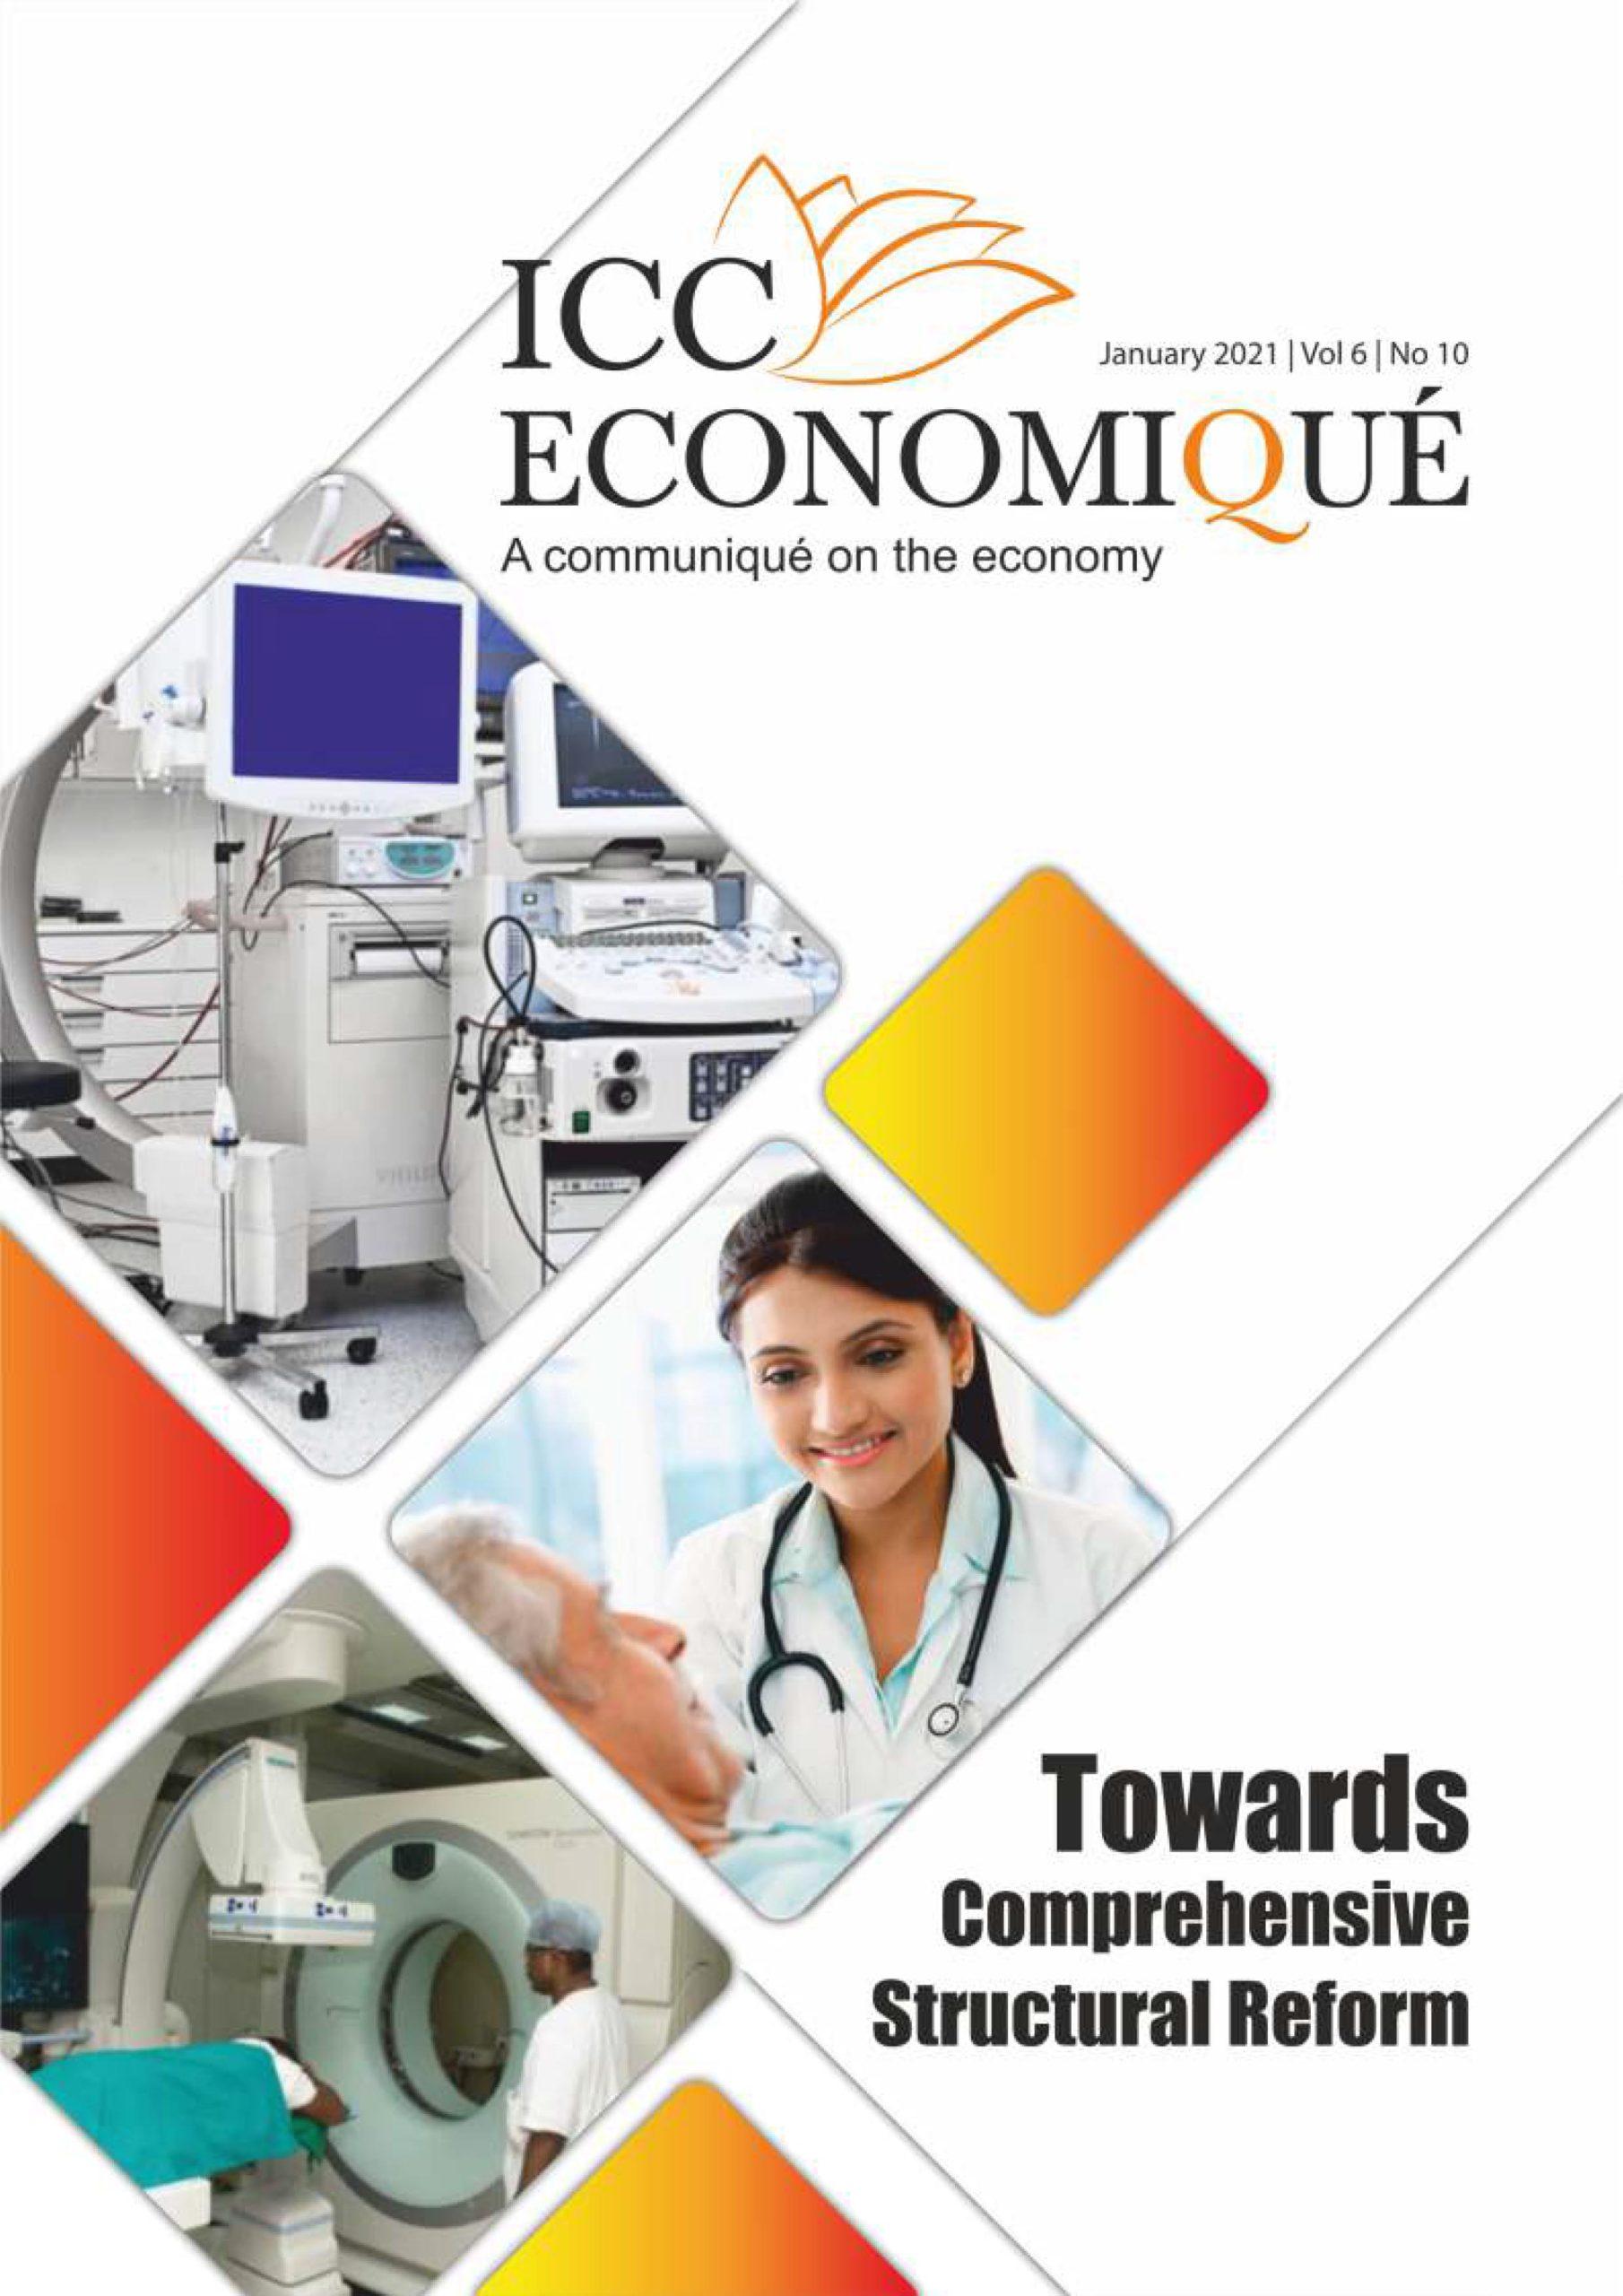 ICC Economique January 2021 | Vol 6 | No 10